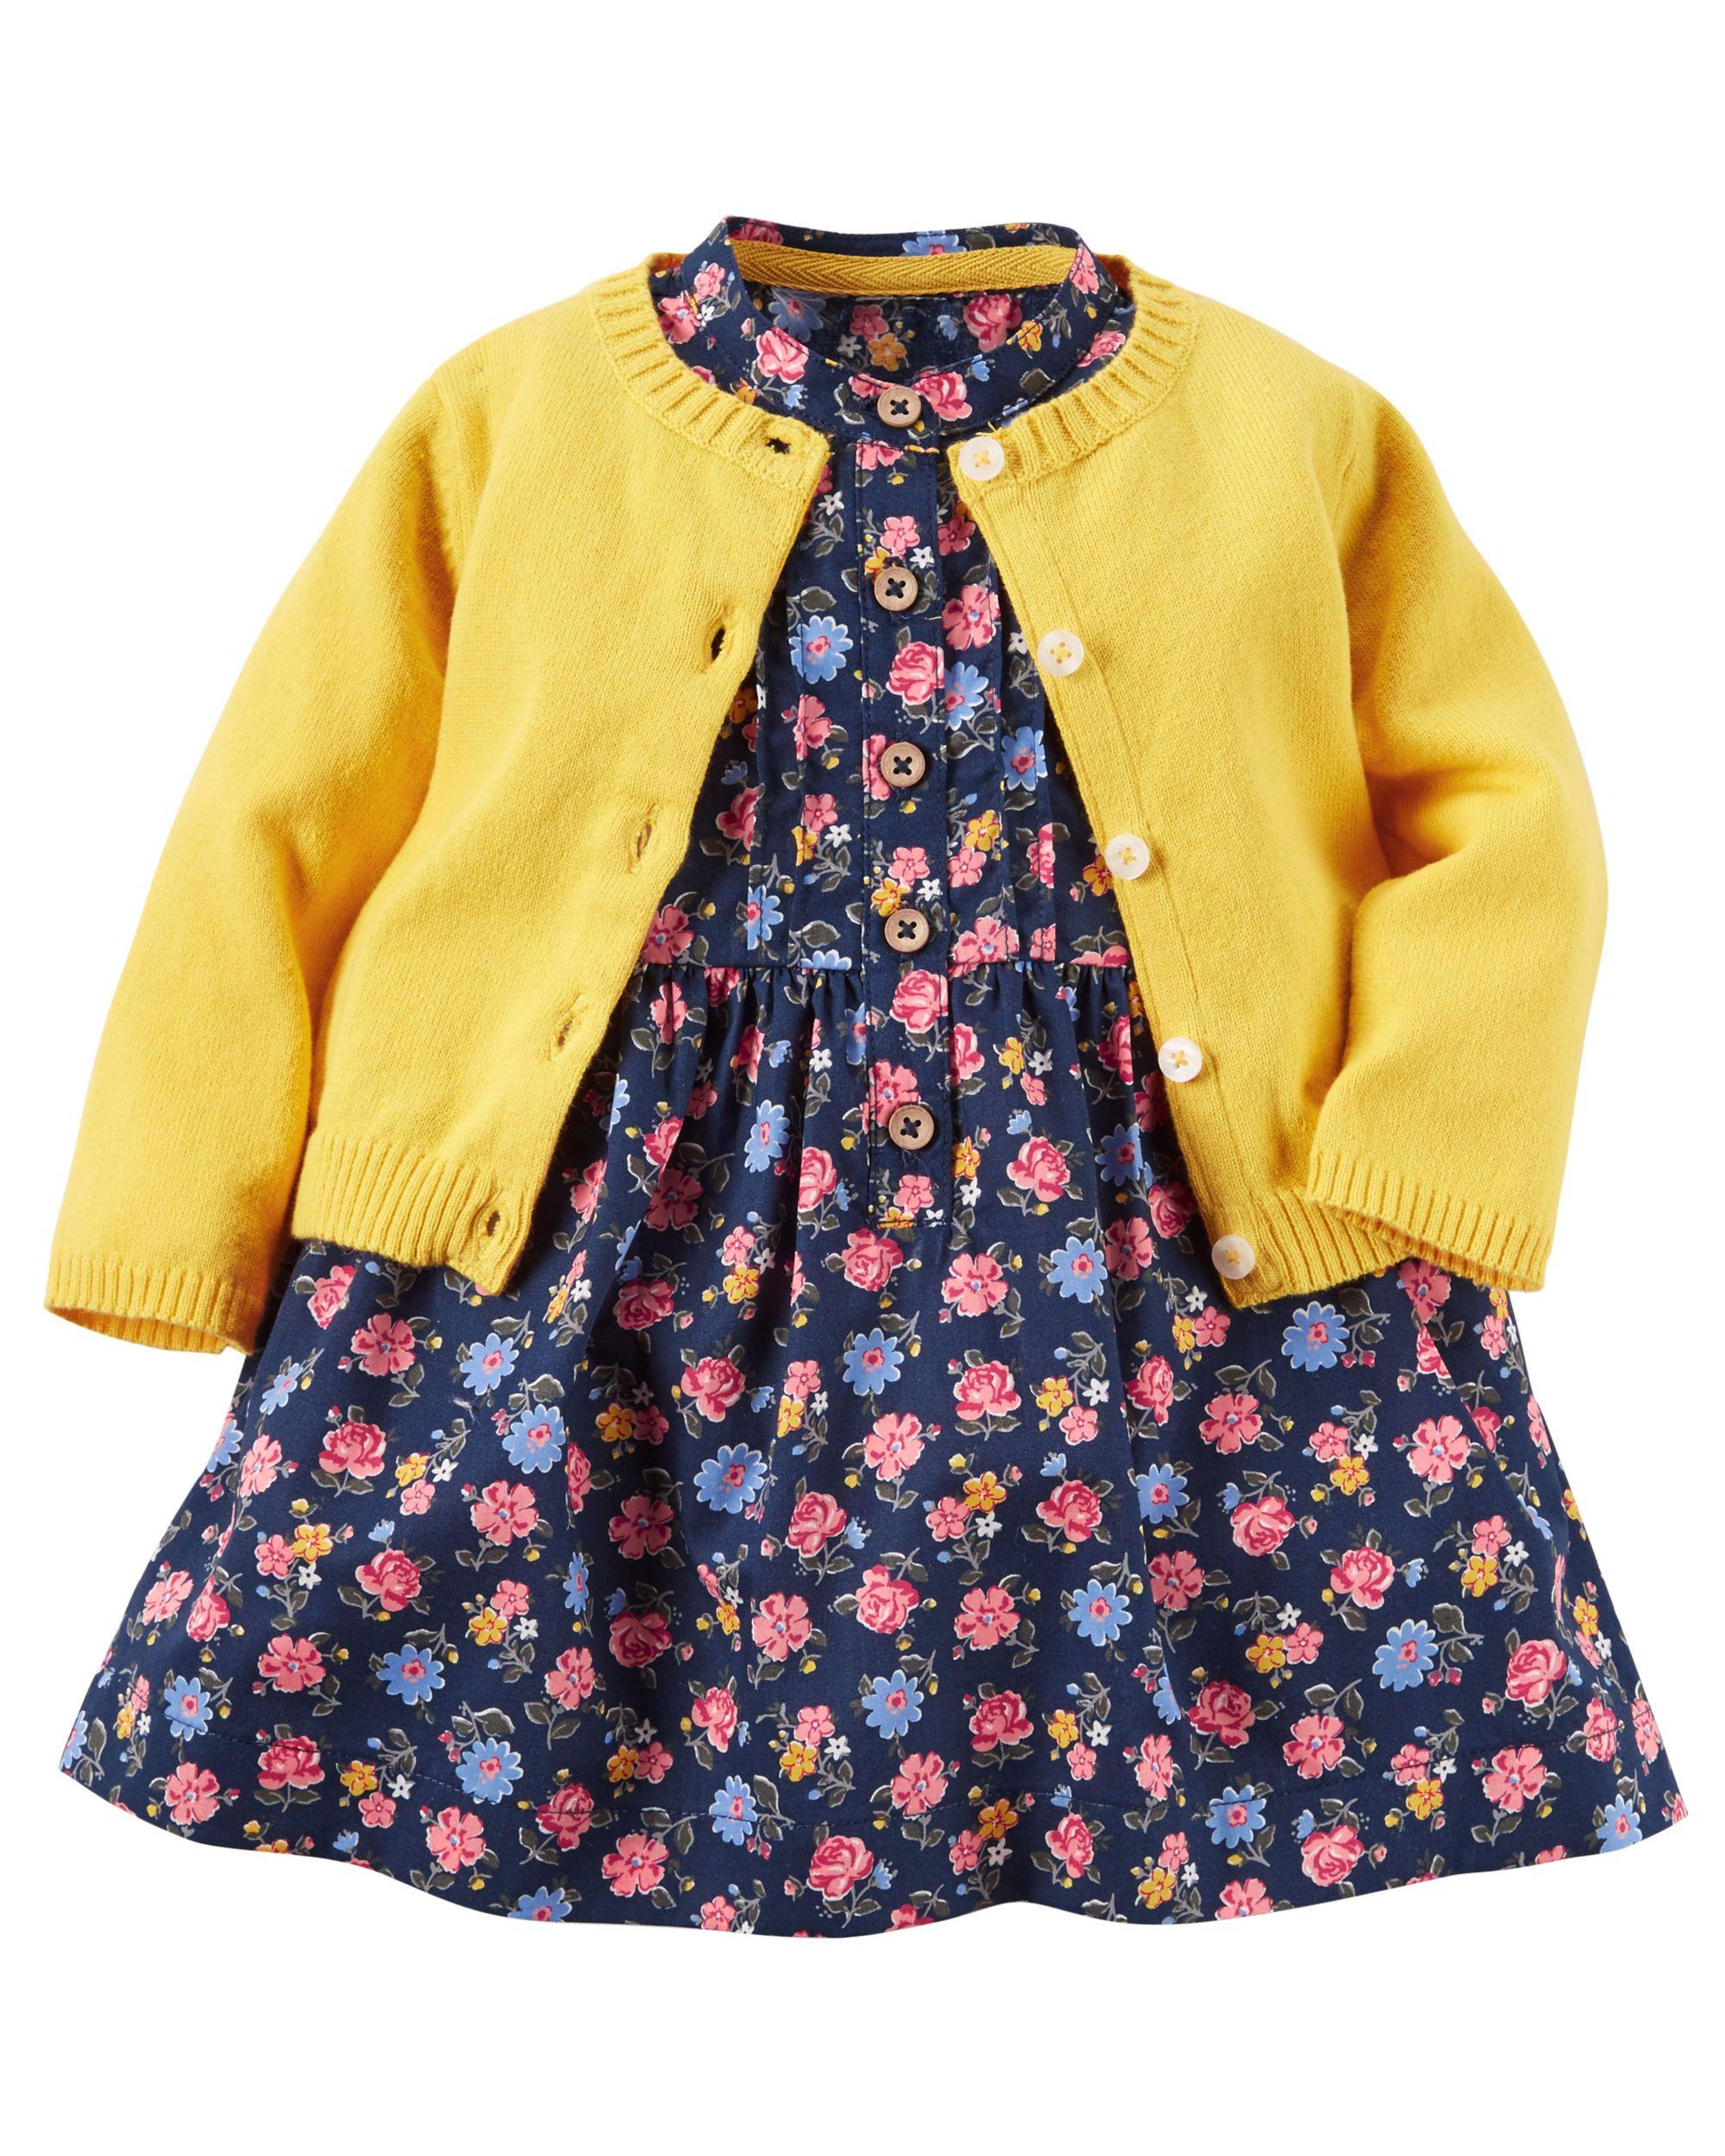 2 Piece Poplin Dress & Sweater Set